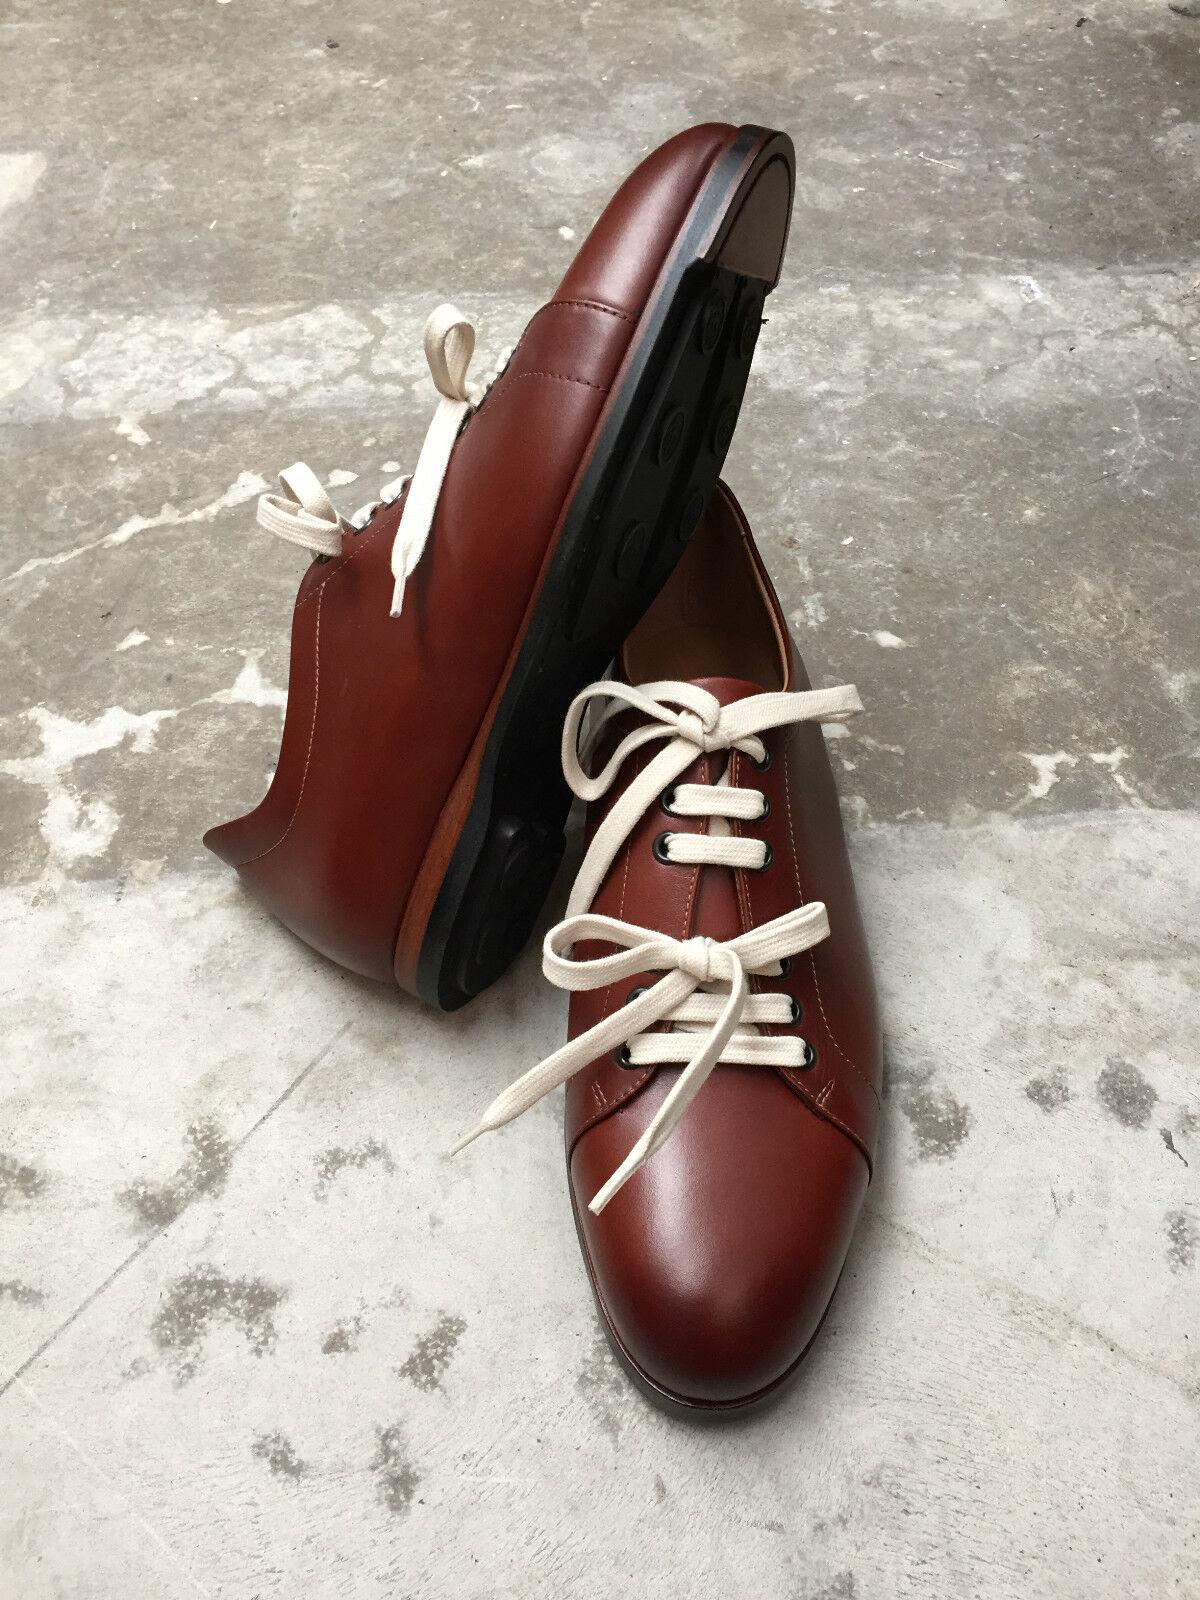 MAN - scarpe da ginnastica ginnastica ginnastica - CALF COGNAC - STITCHED RUBBER SOLE | Facile Da Pulire Surface  942e80